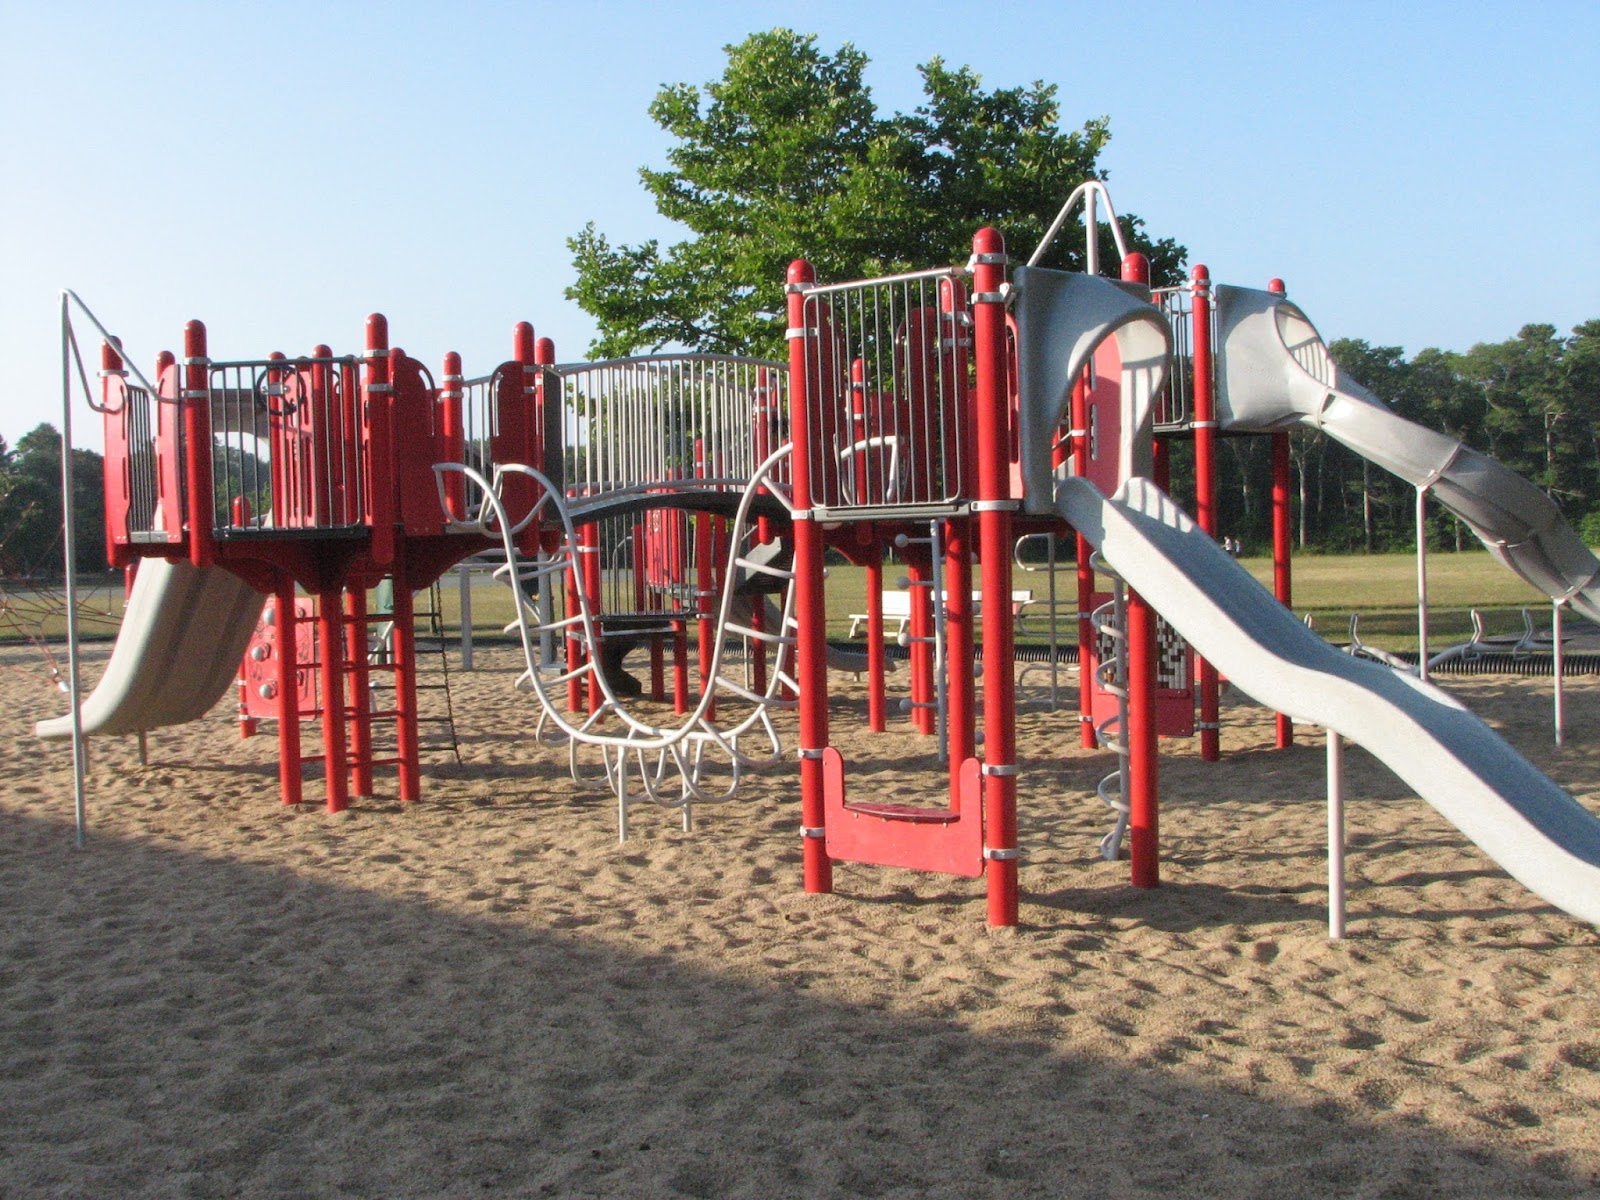 east falmouth elementary school playground davisville road east